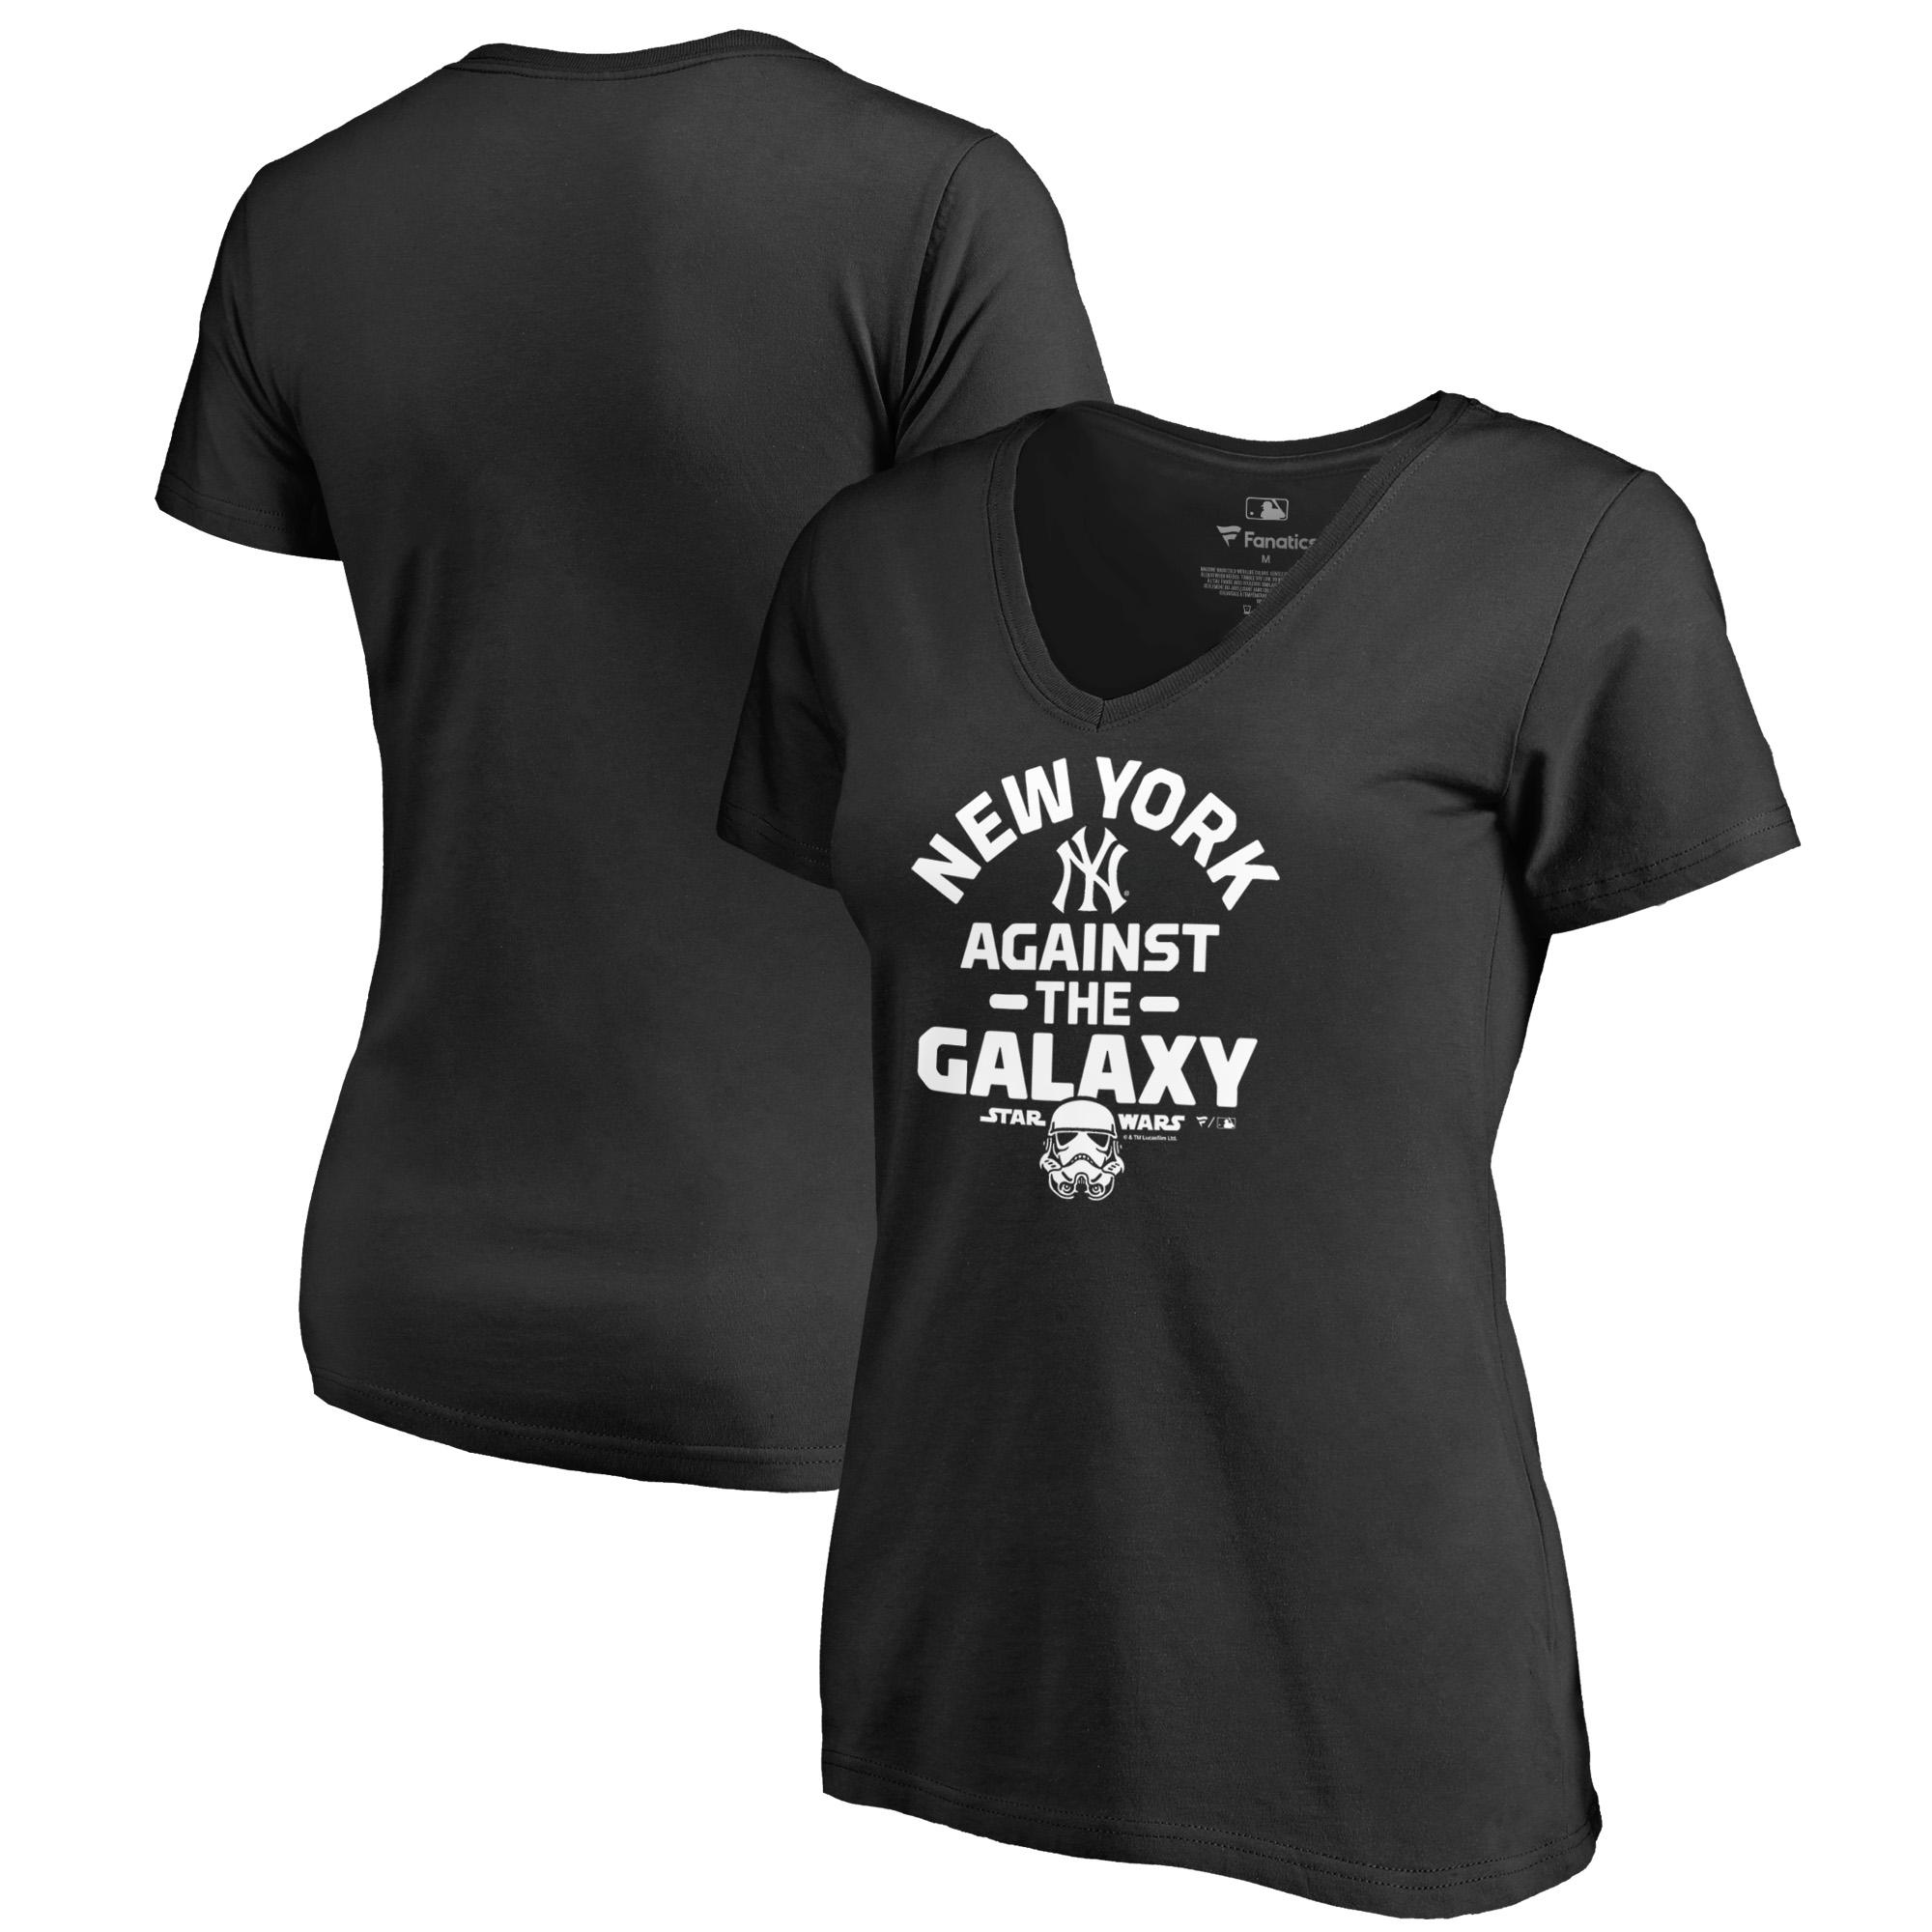 New York Yankees Fanatics Branded Women's MLB Star Wars Against The Galaxy V-Neck T-Shirt - Black